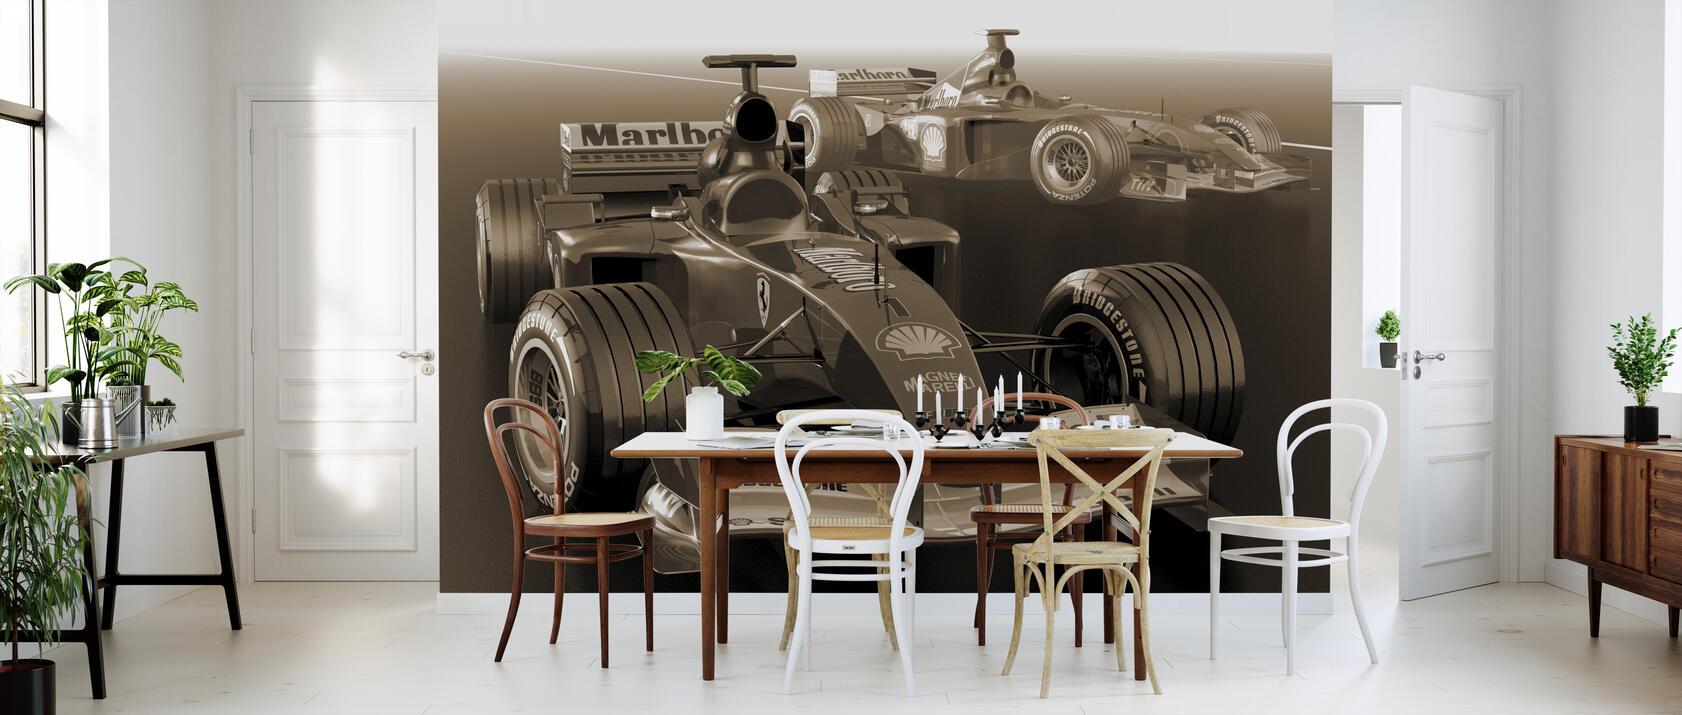 classic racing car sepia fototapete nach ma photowall. Black Bedroom Furniture Sets. Home Design Ideas